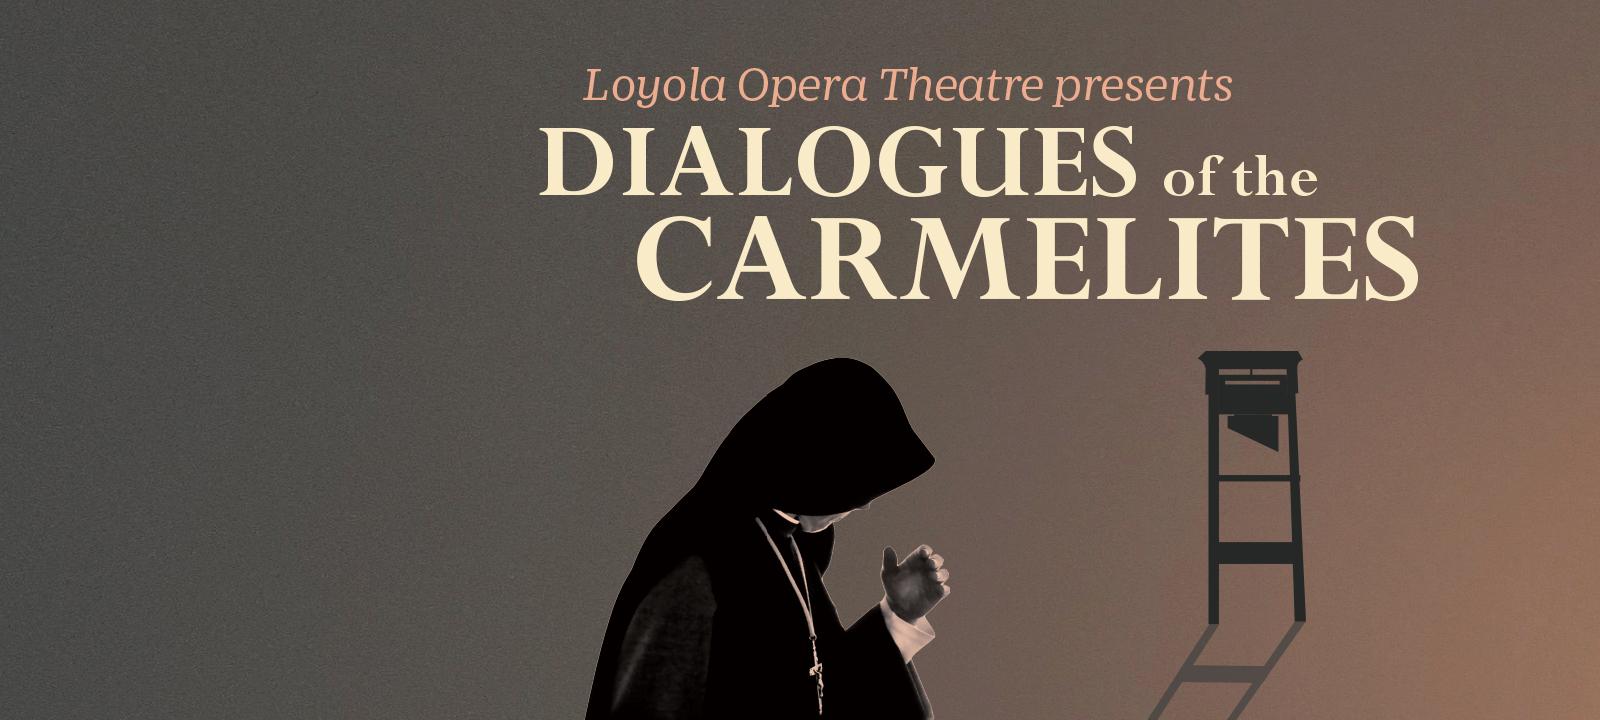 Francis Poulenc's opera opens March 22